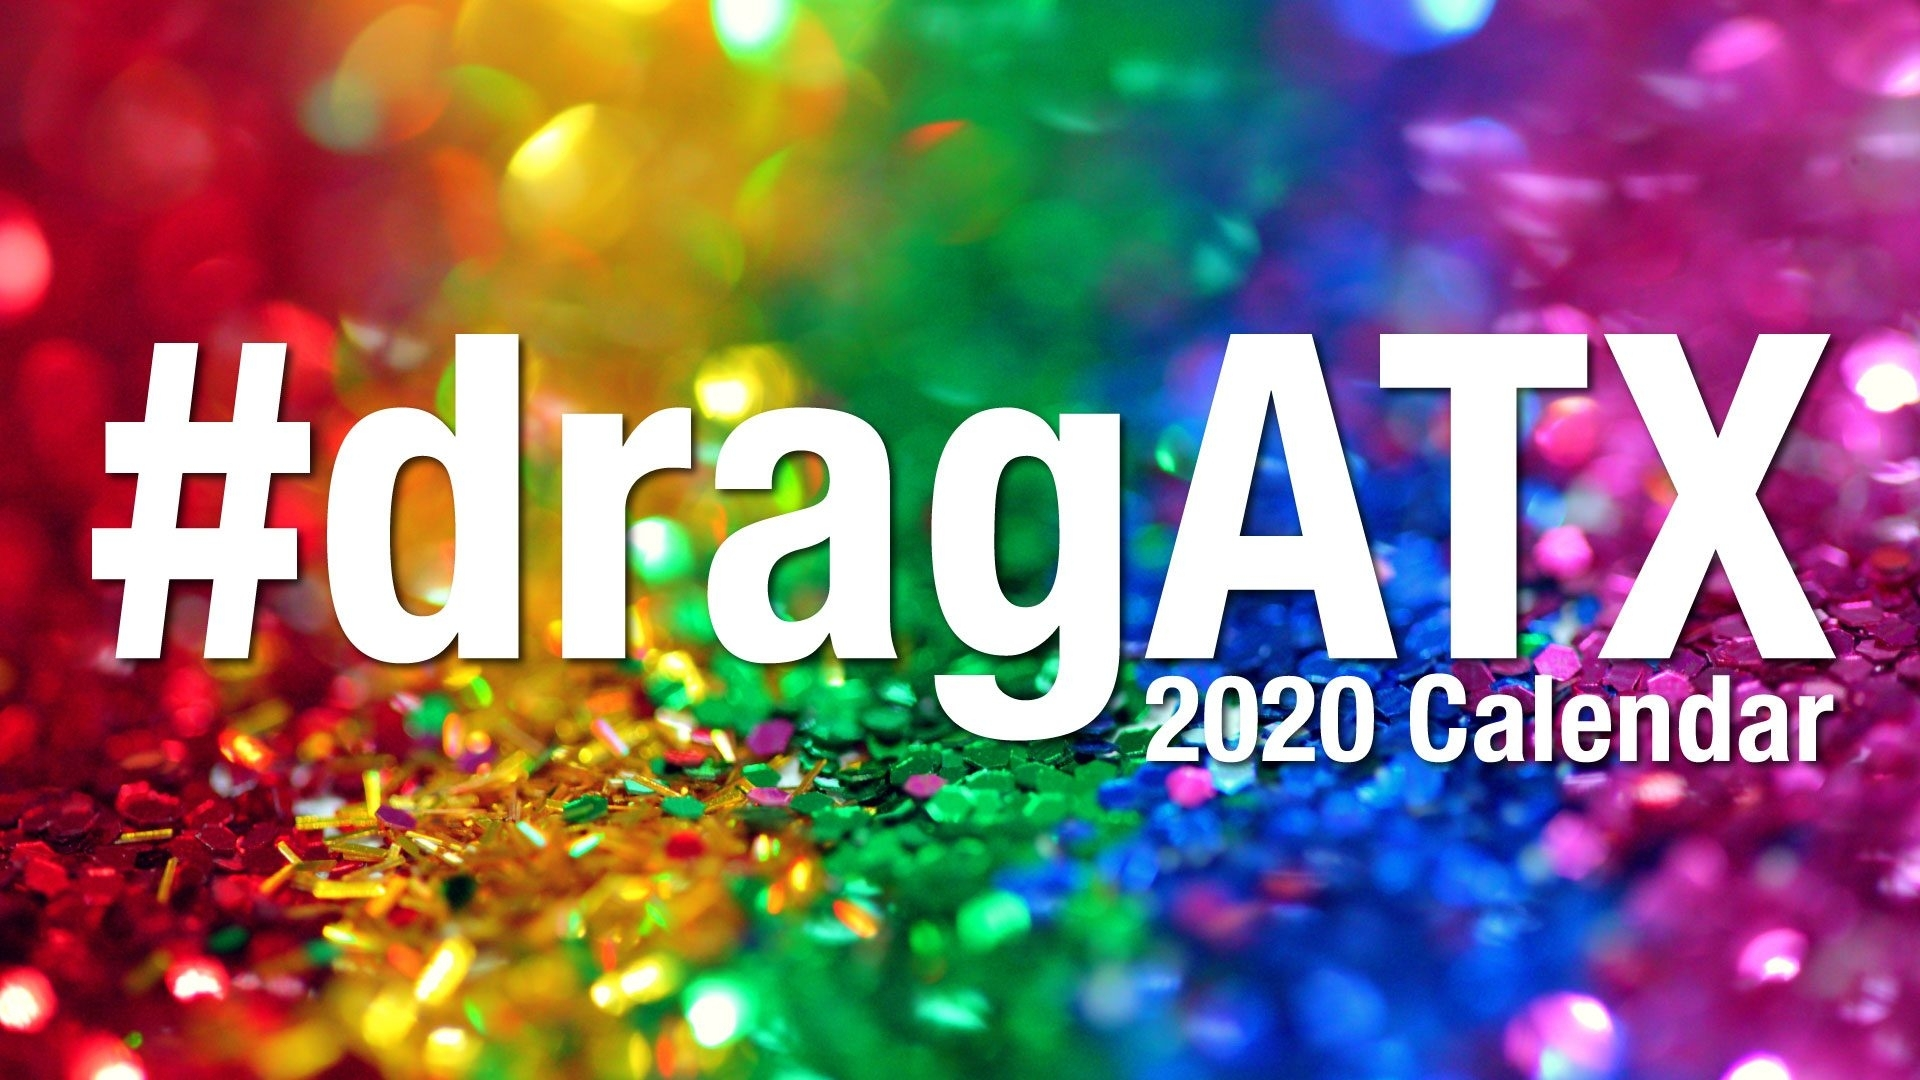 Dragatx 2020 Calendar - Therepubliq within Stephen F Austin Calendar 2019 - 2020